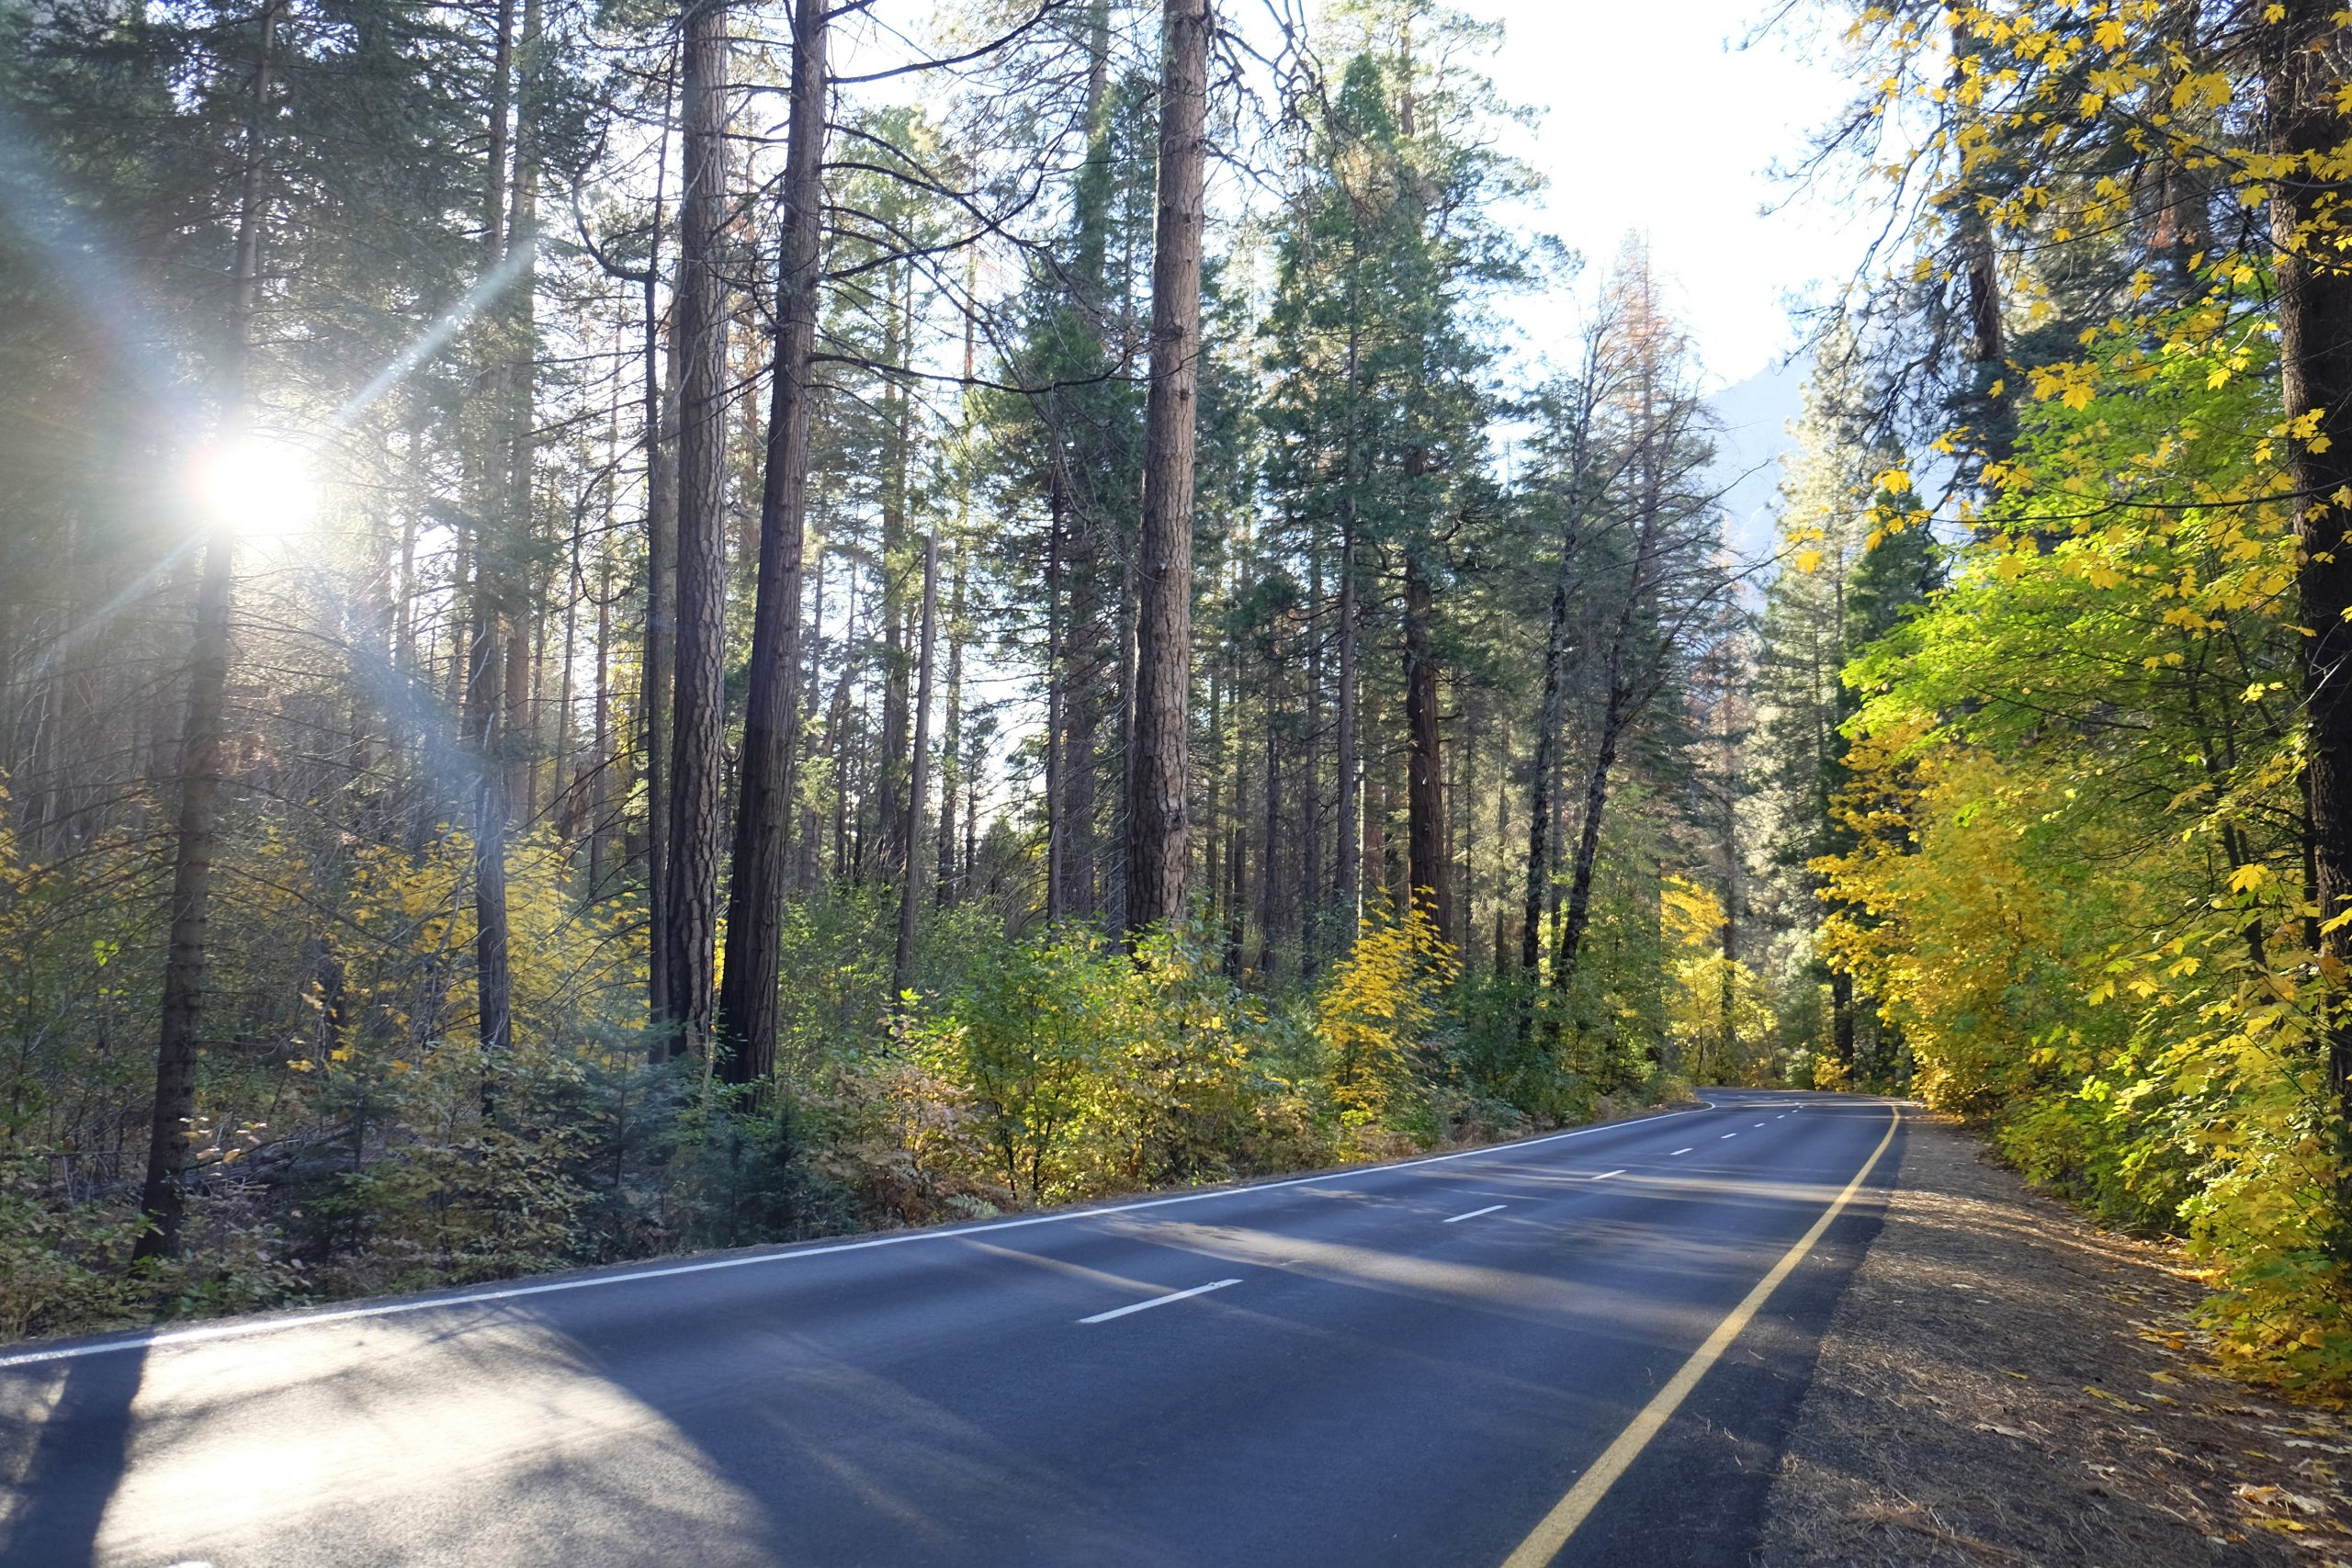 Road sun through trees